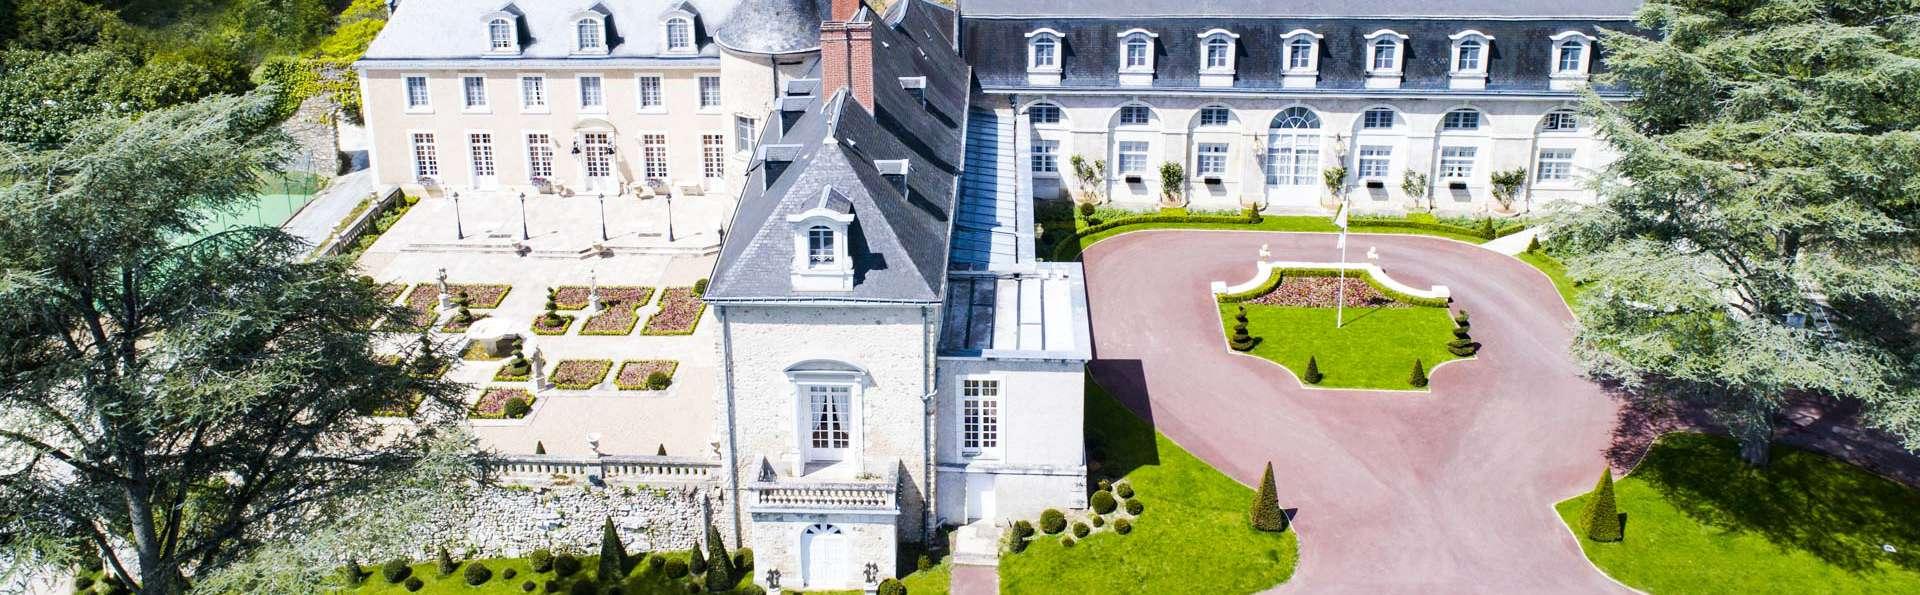 Château de Beauvois  - EDIT_N3_EXTERIOR4.jpg